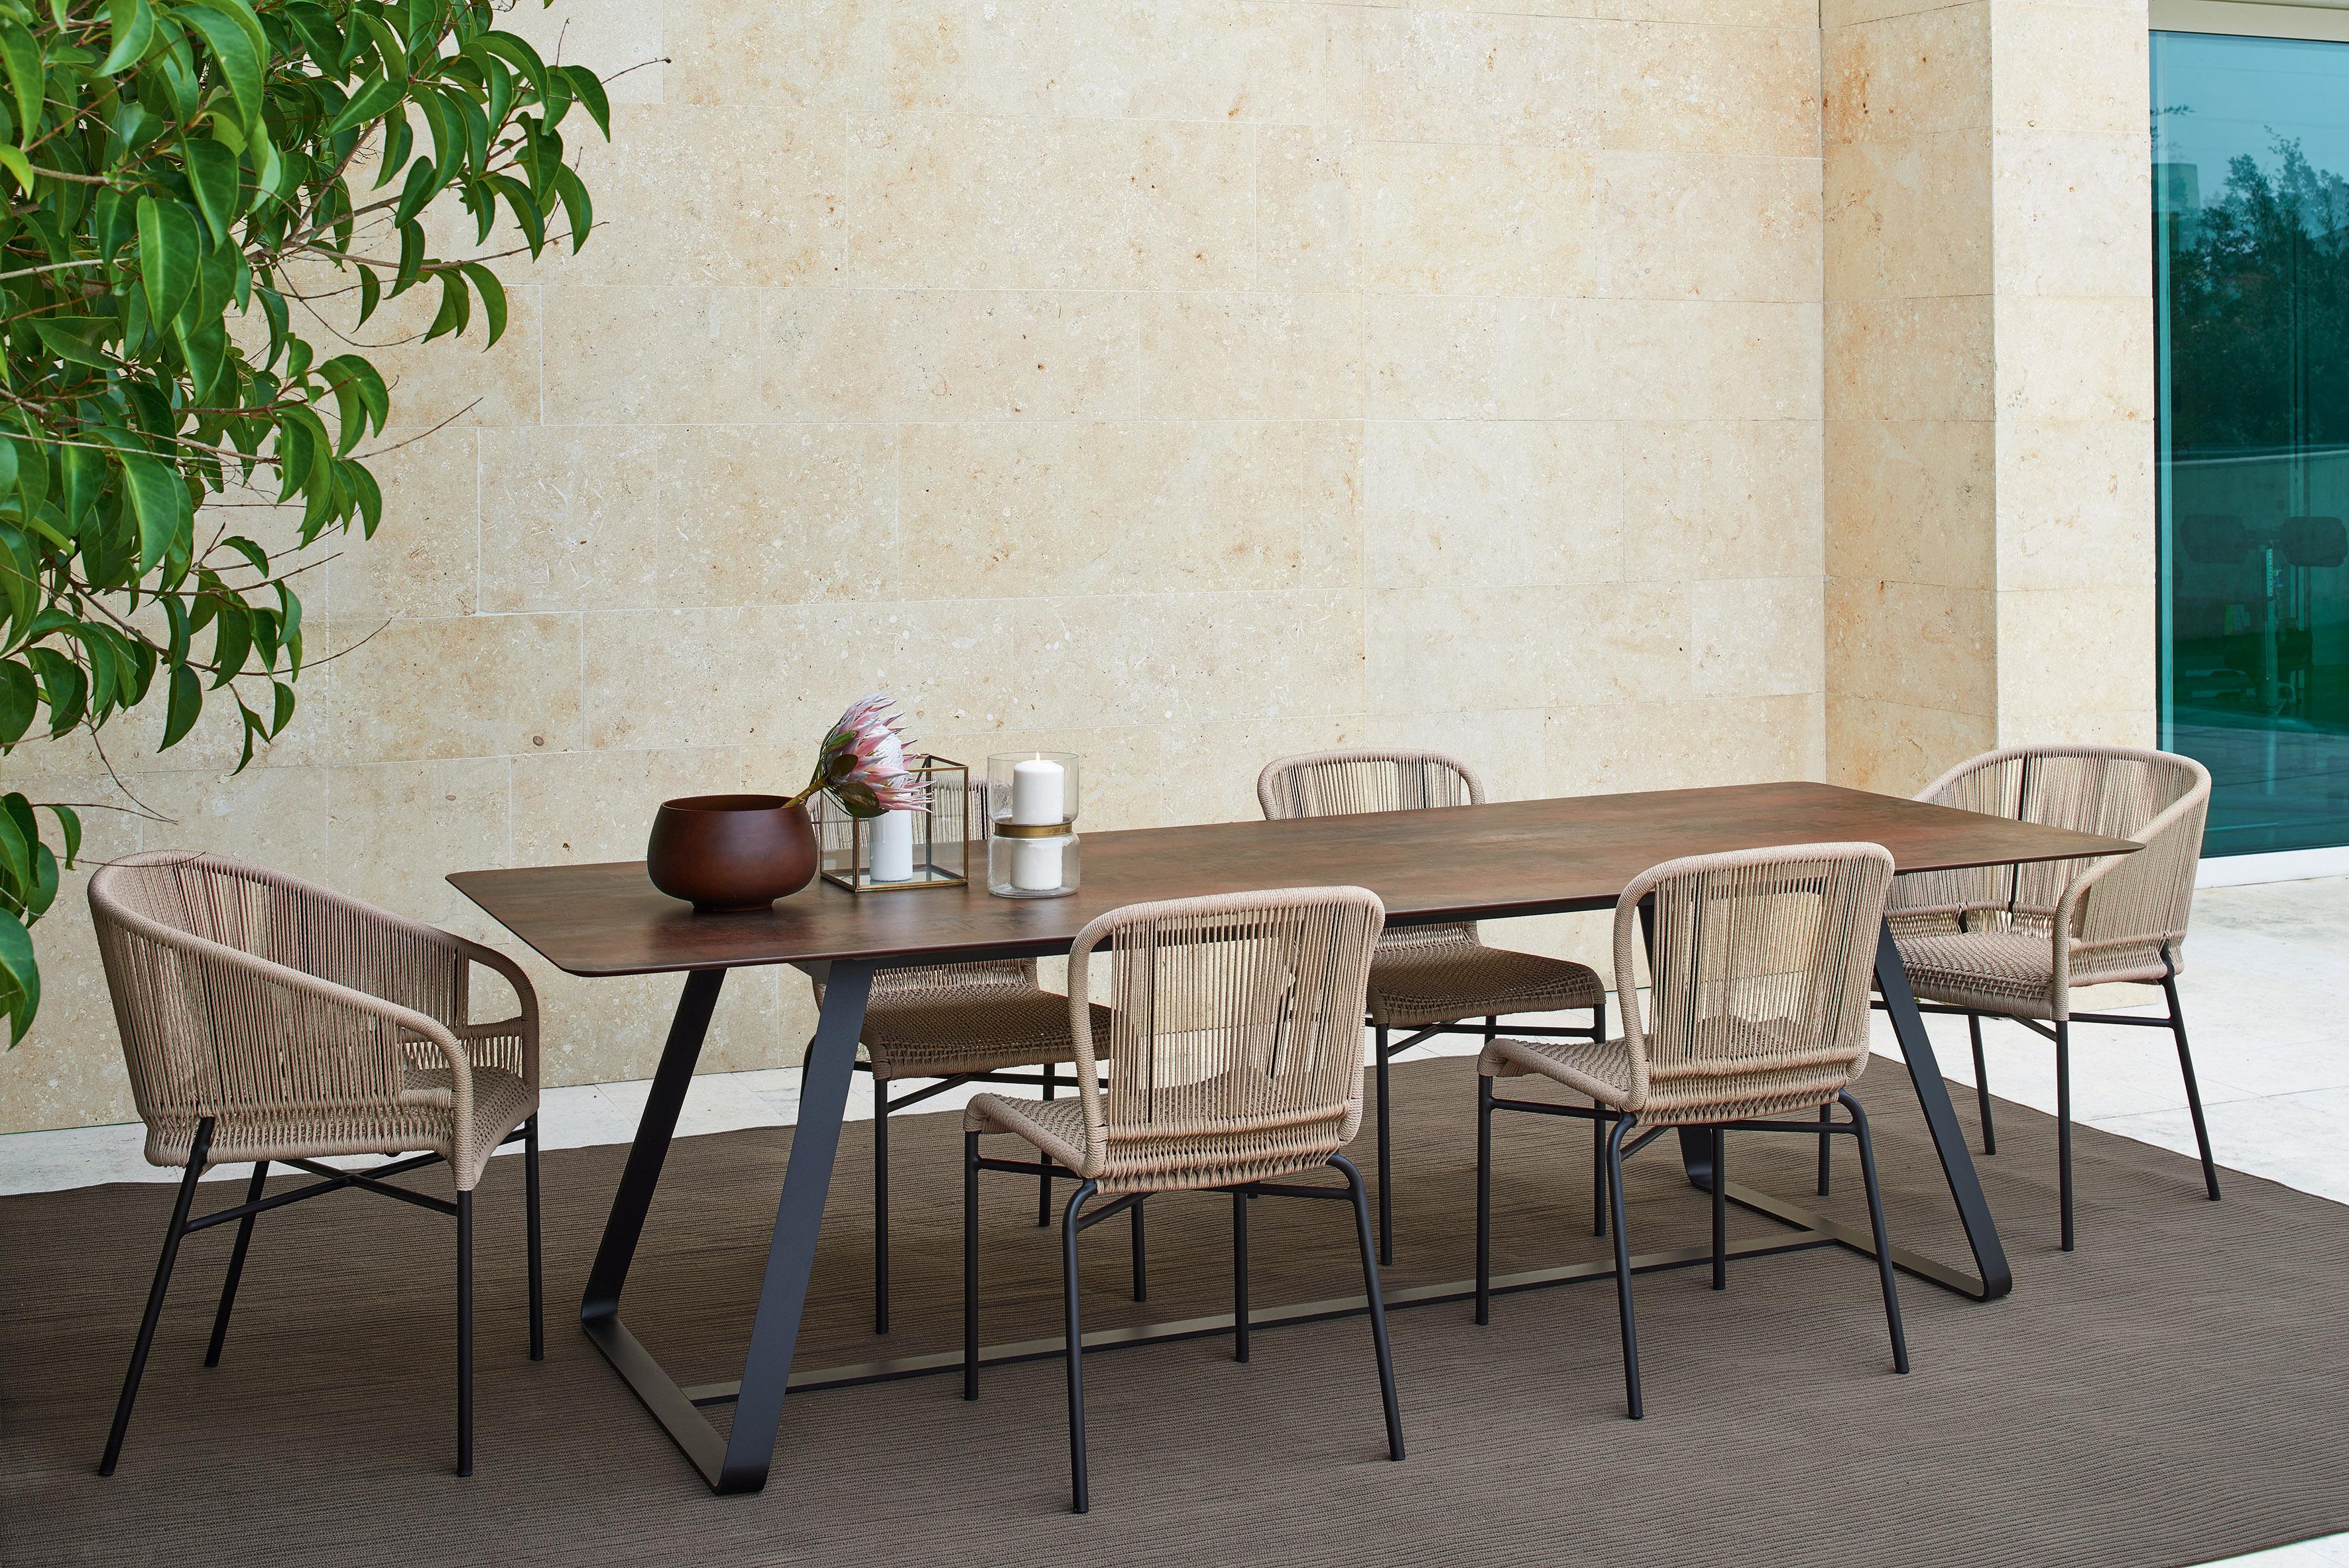 Cricket outdoor designer chair for Varaschin arredo giardino